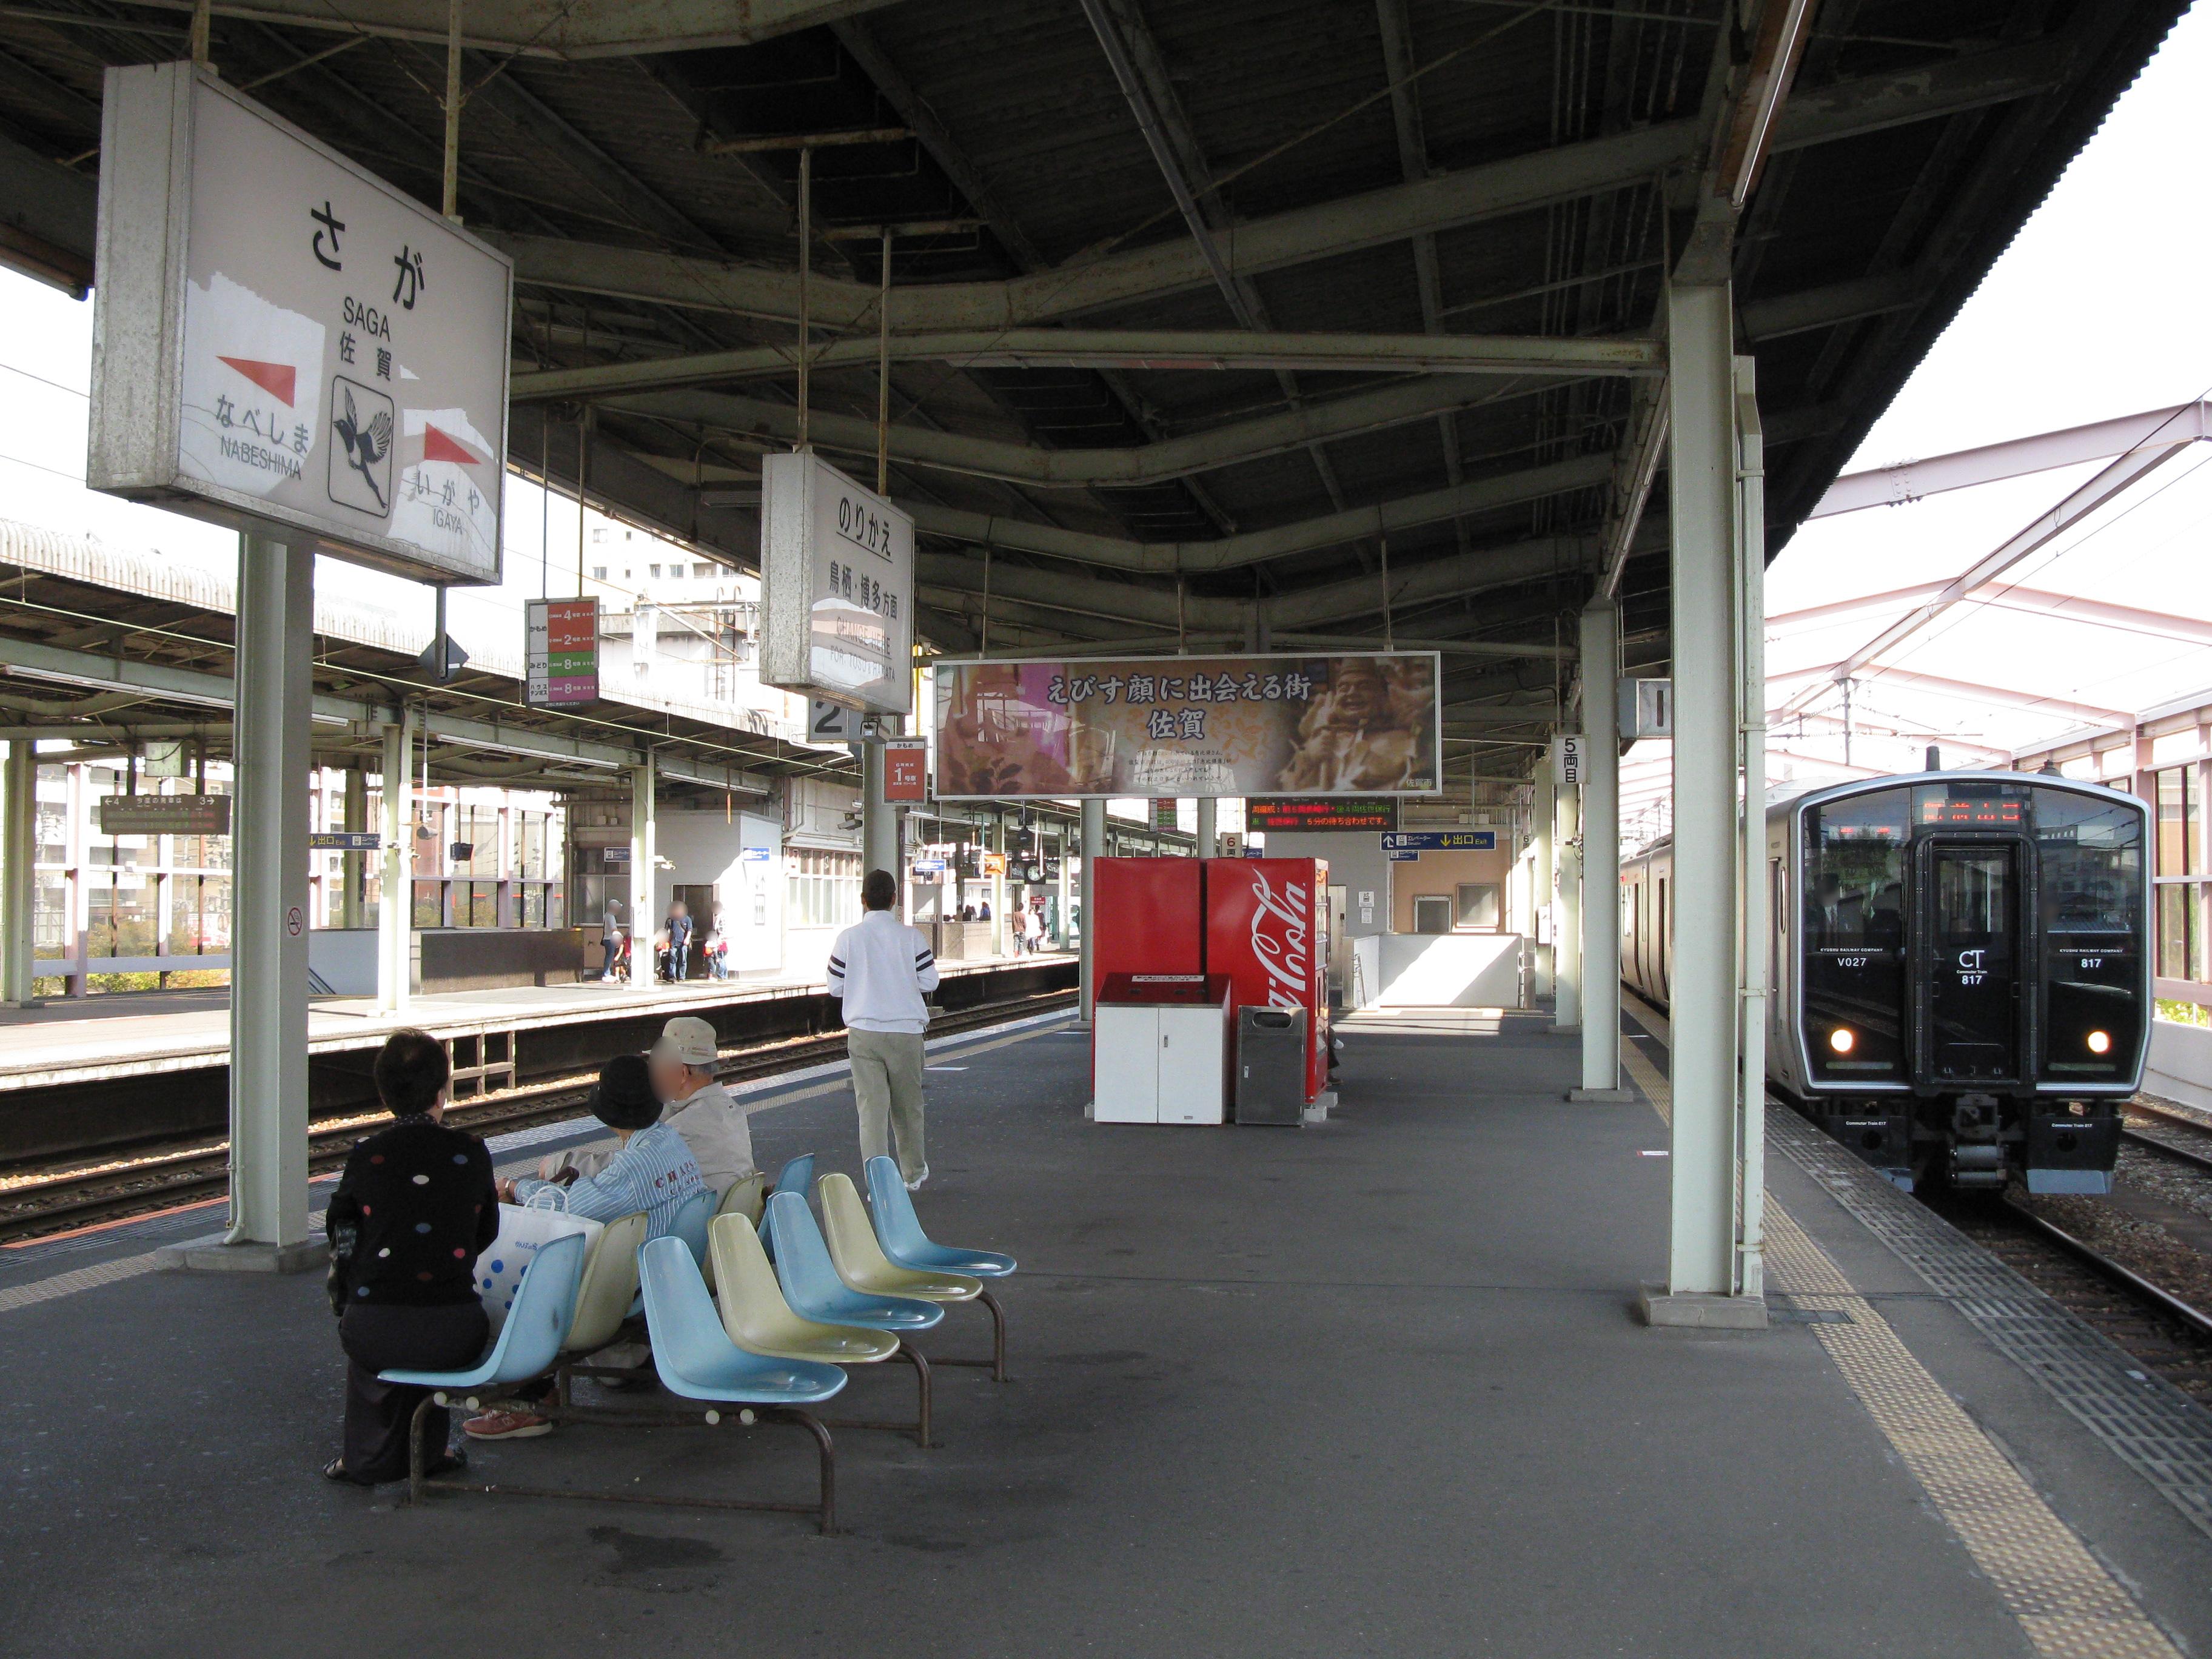 https://upload.wikimedia.org/wikipedia/commons/6/6a/JRKyushu-Nagasaki-main-line-Saga-station-platform-1-2-20091031.jpg